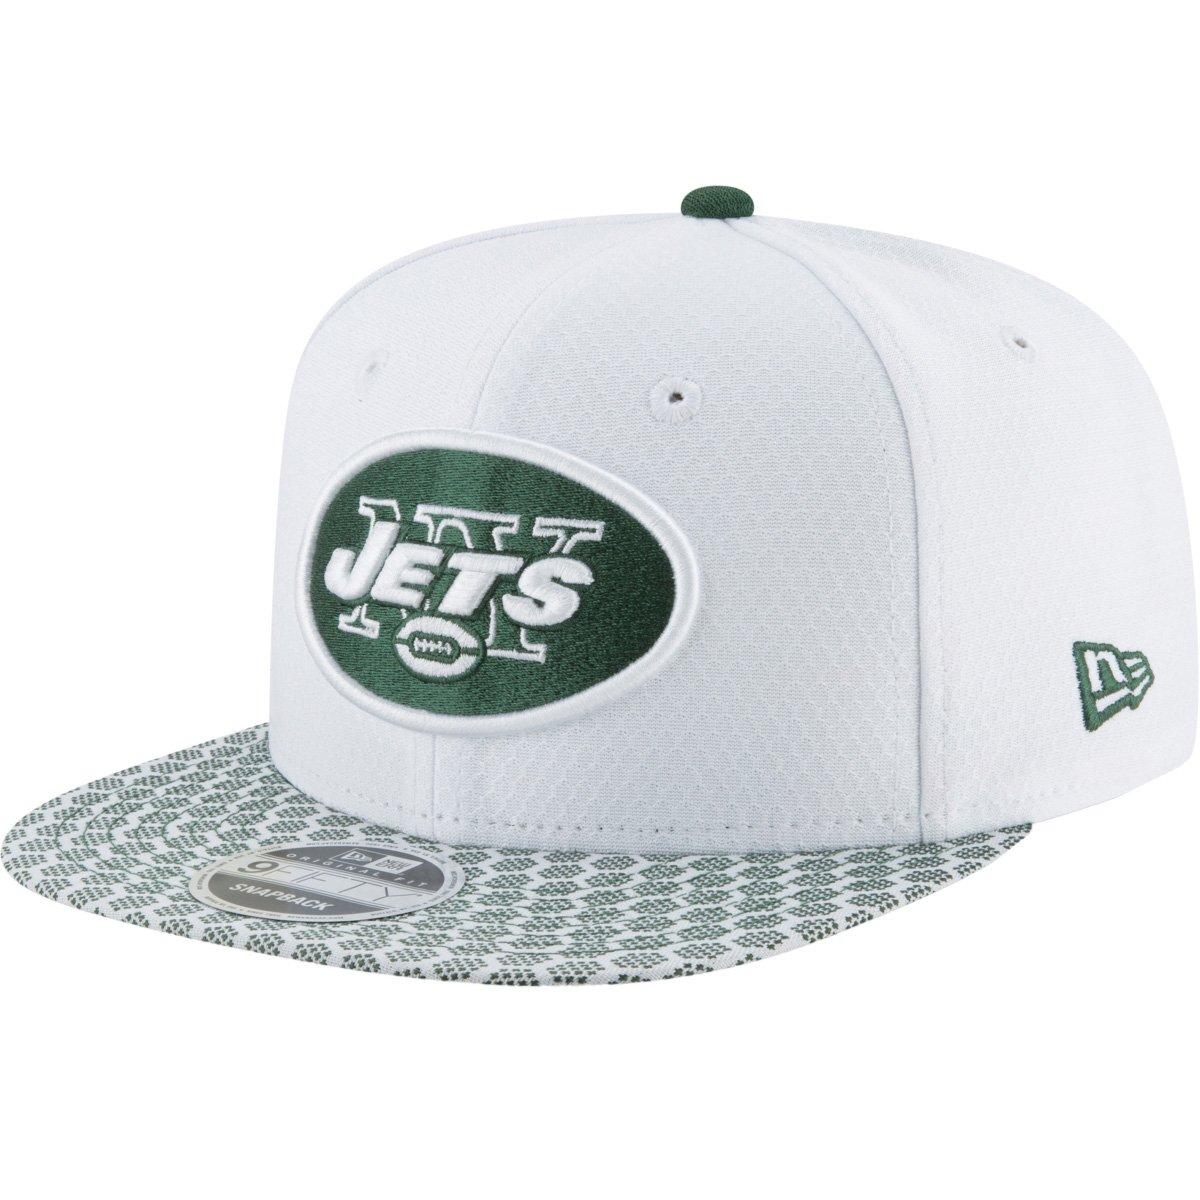 Details about New Era Snapback Cap - NFL 2017 SIDELINE New York Jets dd78256d6f4